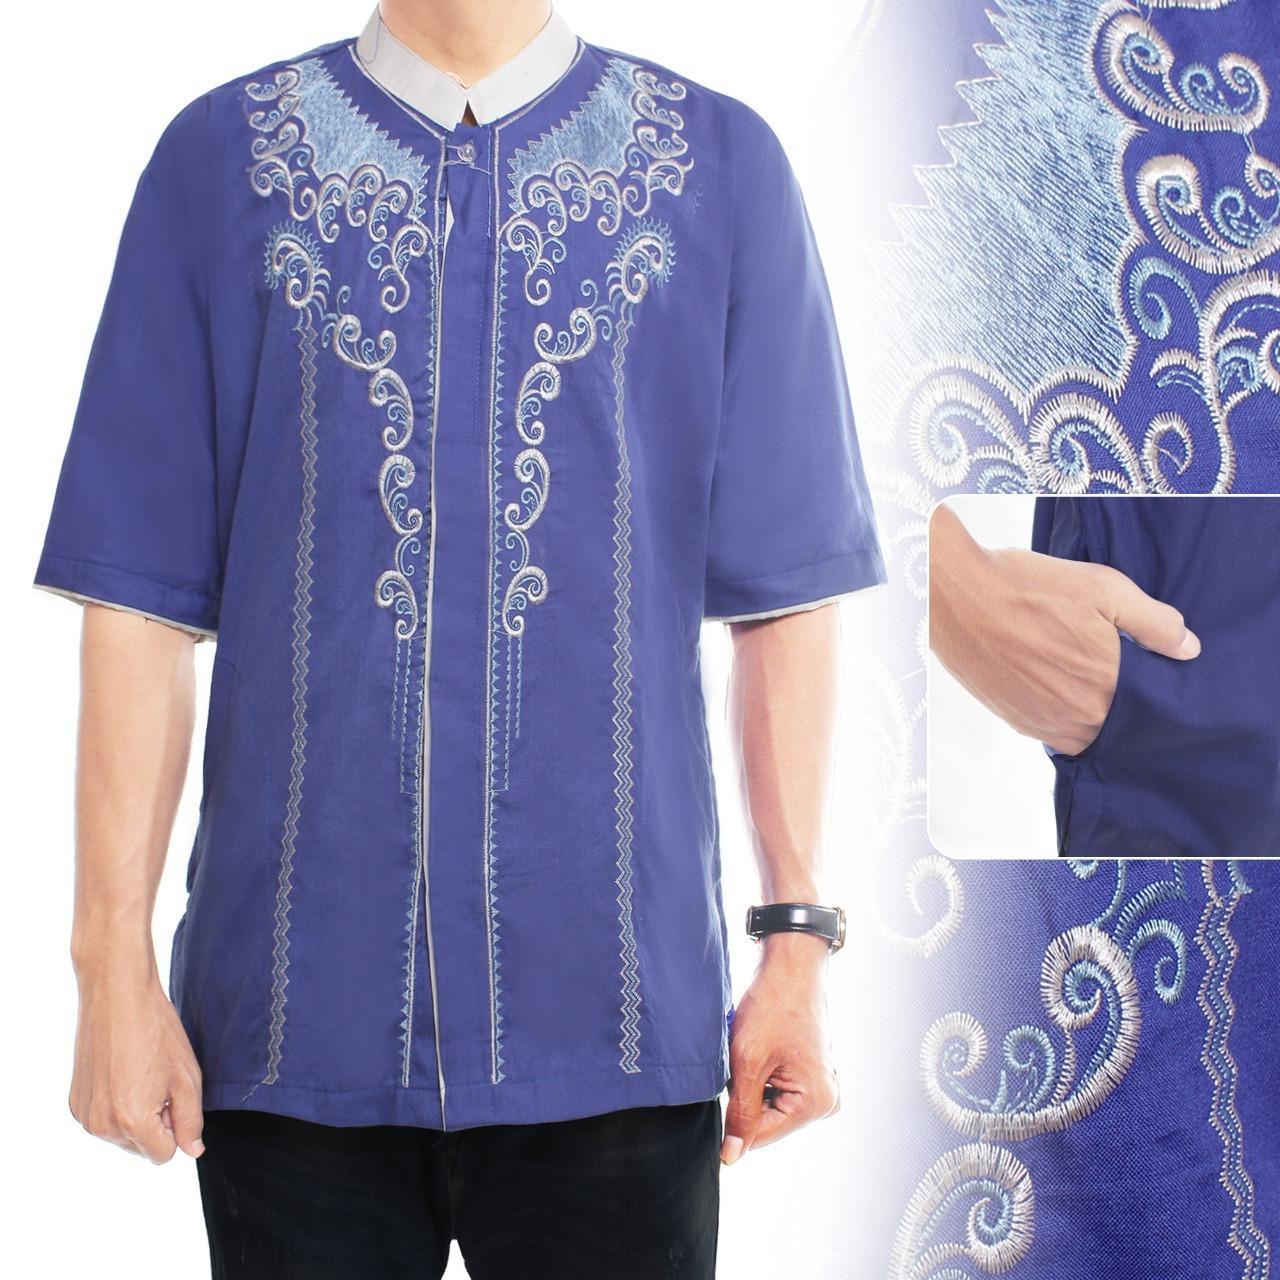 Cj Collection Baju koko atasan kemeja batik pria jumbo shirt Arham